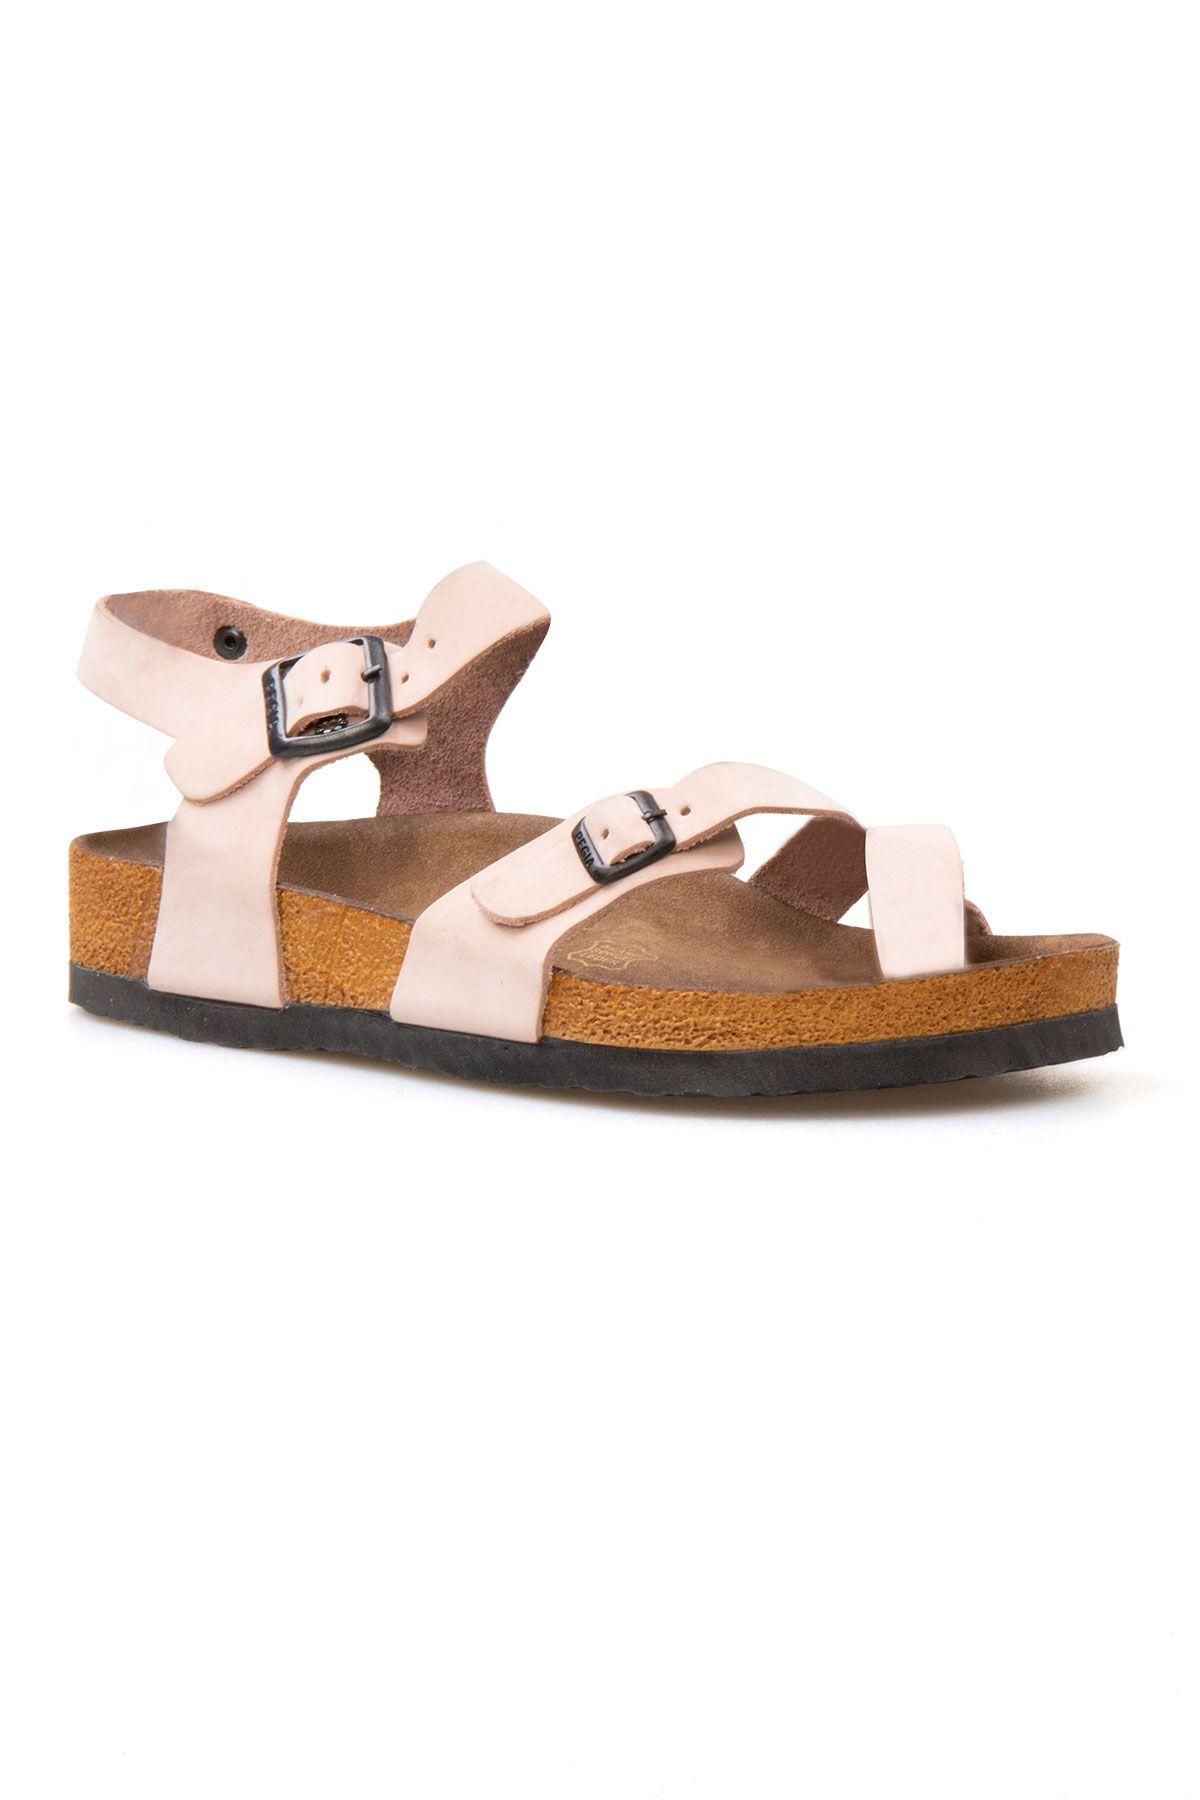 Pegia Genuine Leather Flip-Flops Women's Sandals 215513 Powdery